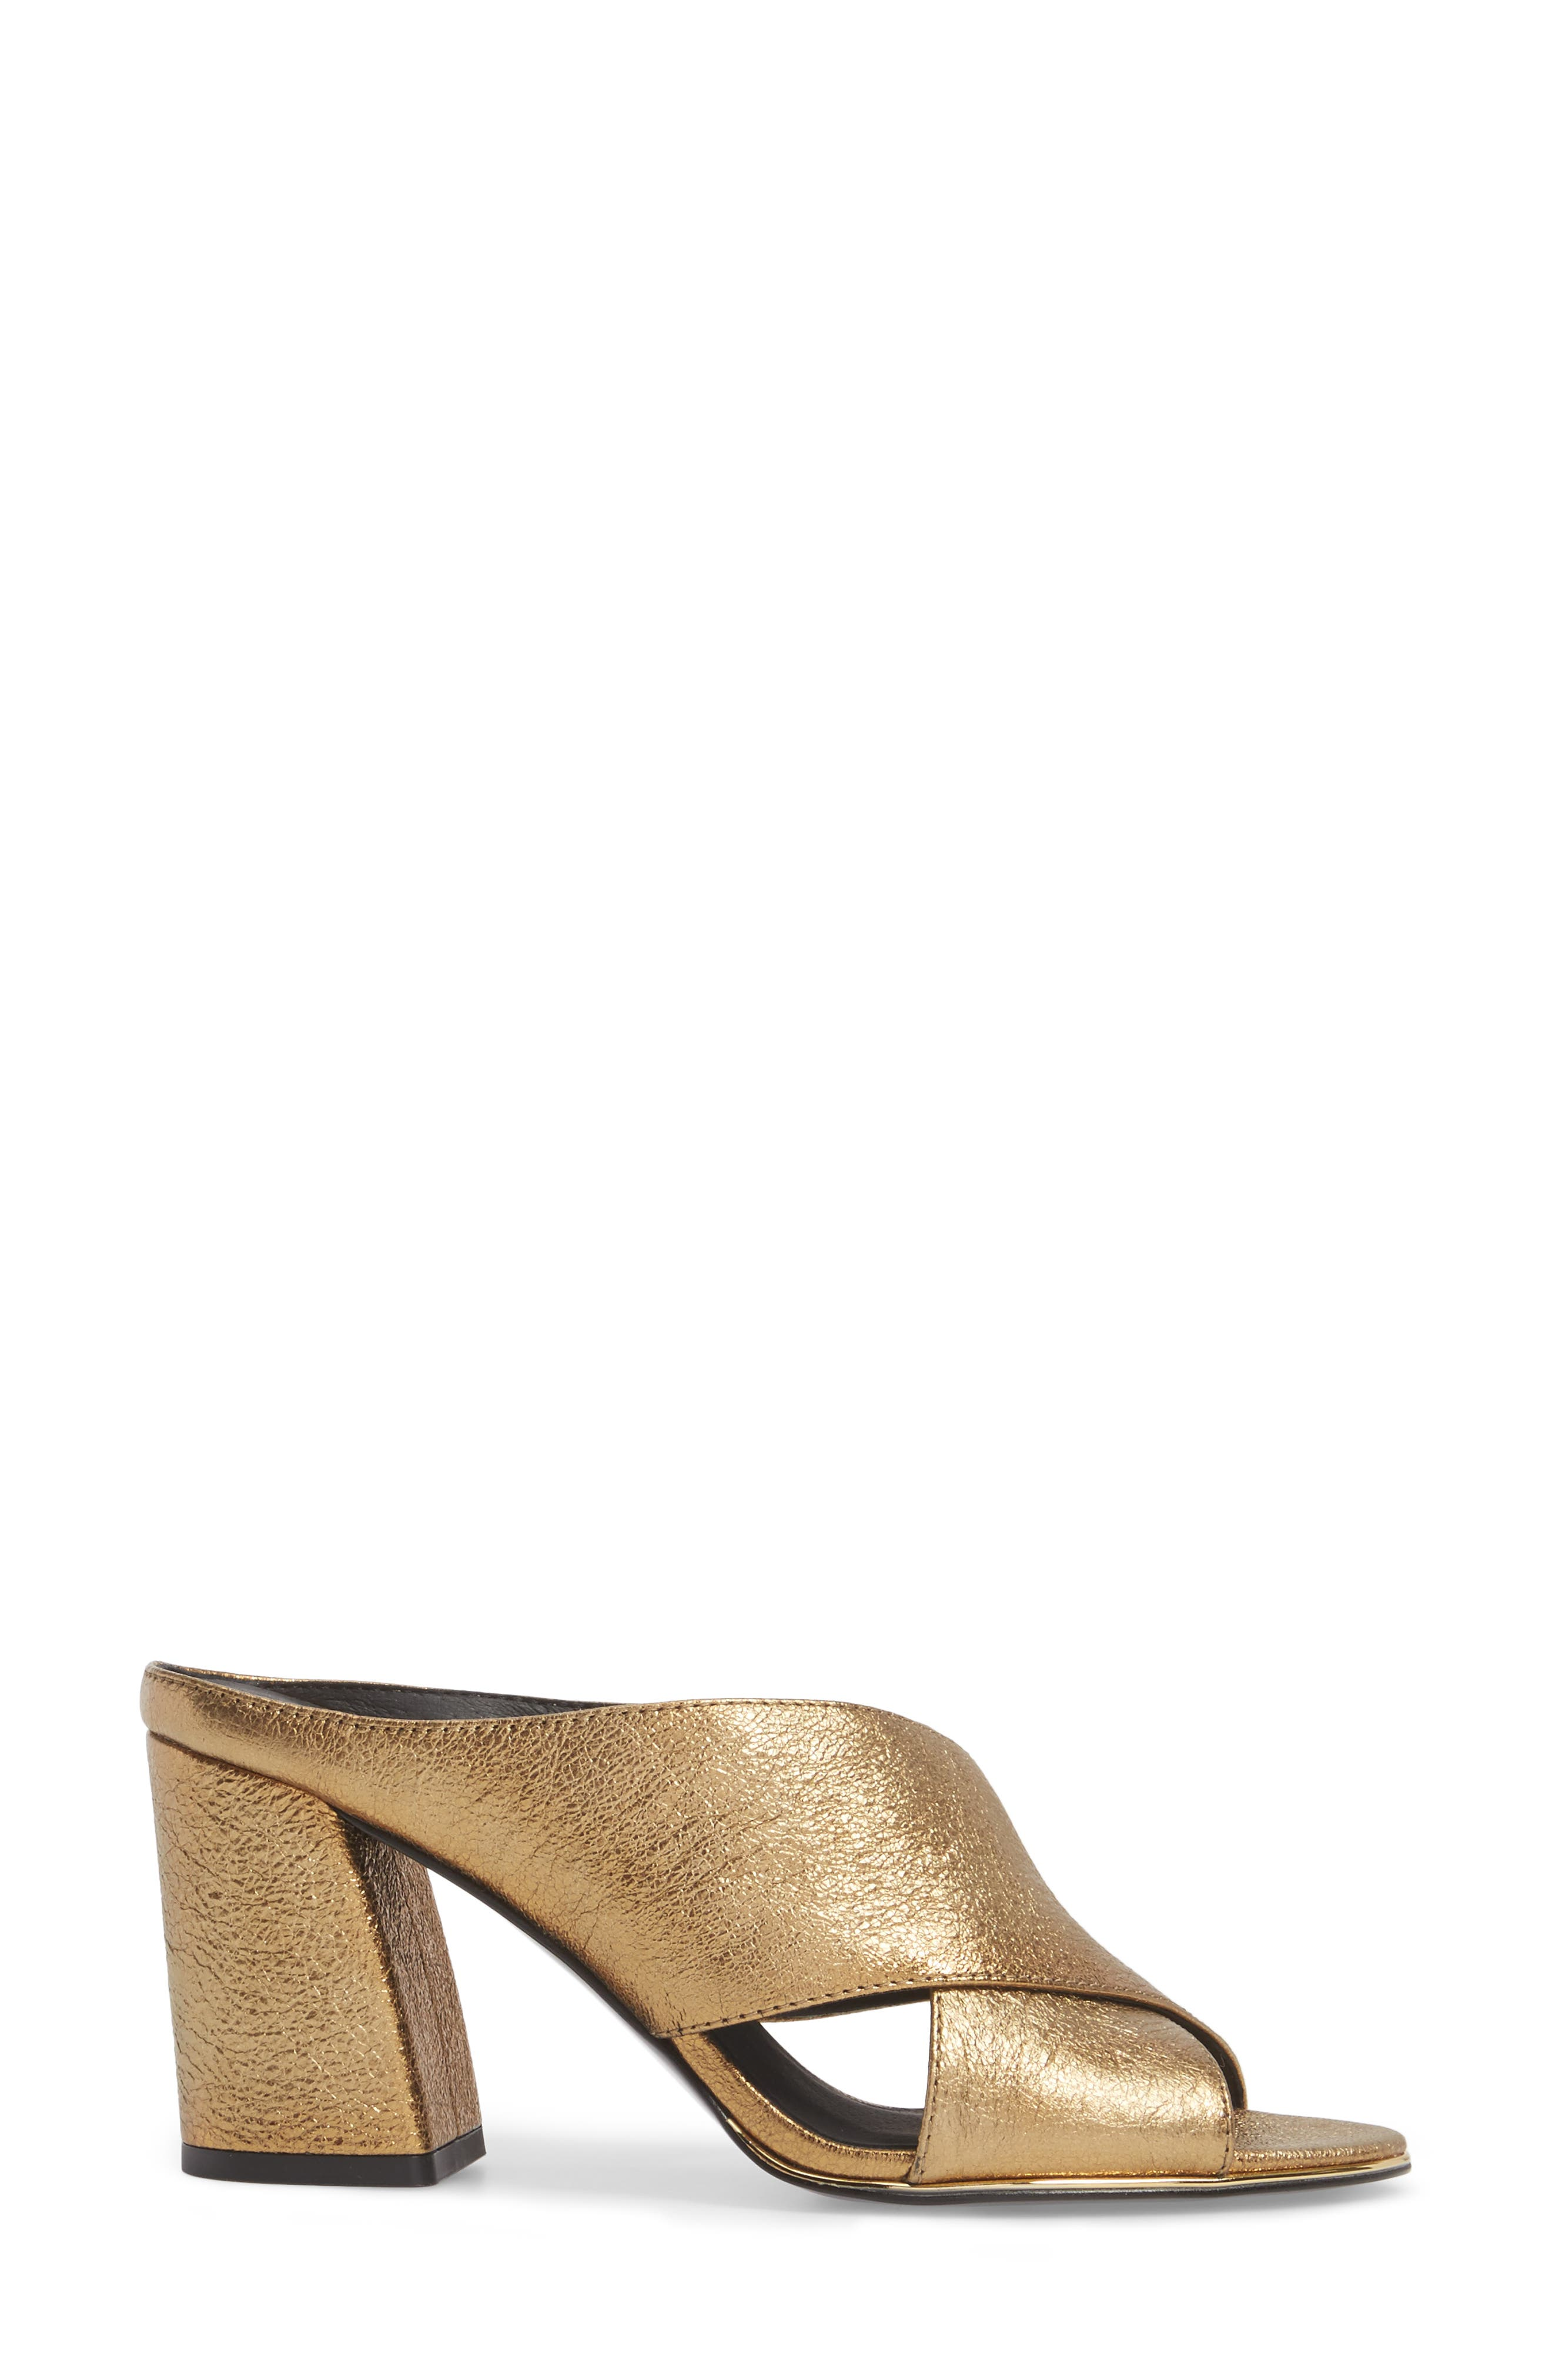 Lyra Sandal,                             Alternate thumbnail 3, color,                             Gold Metallic Leather